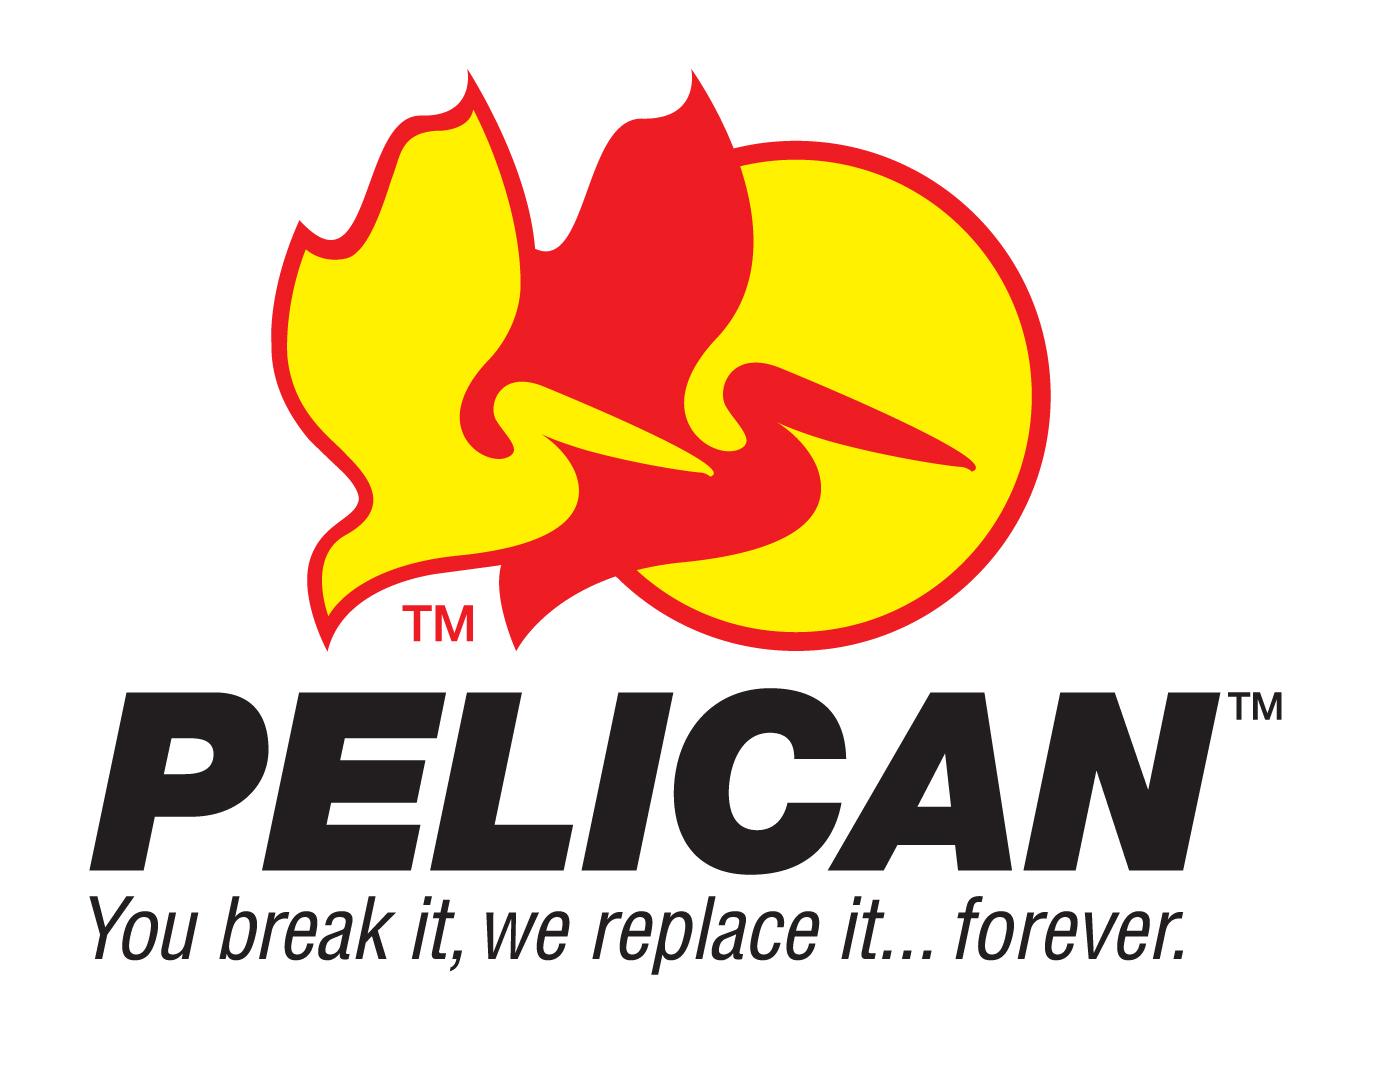 pelican-logo.jpg